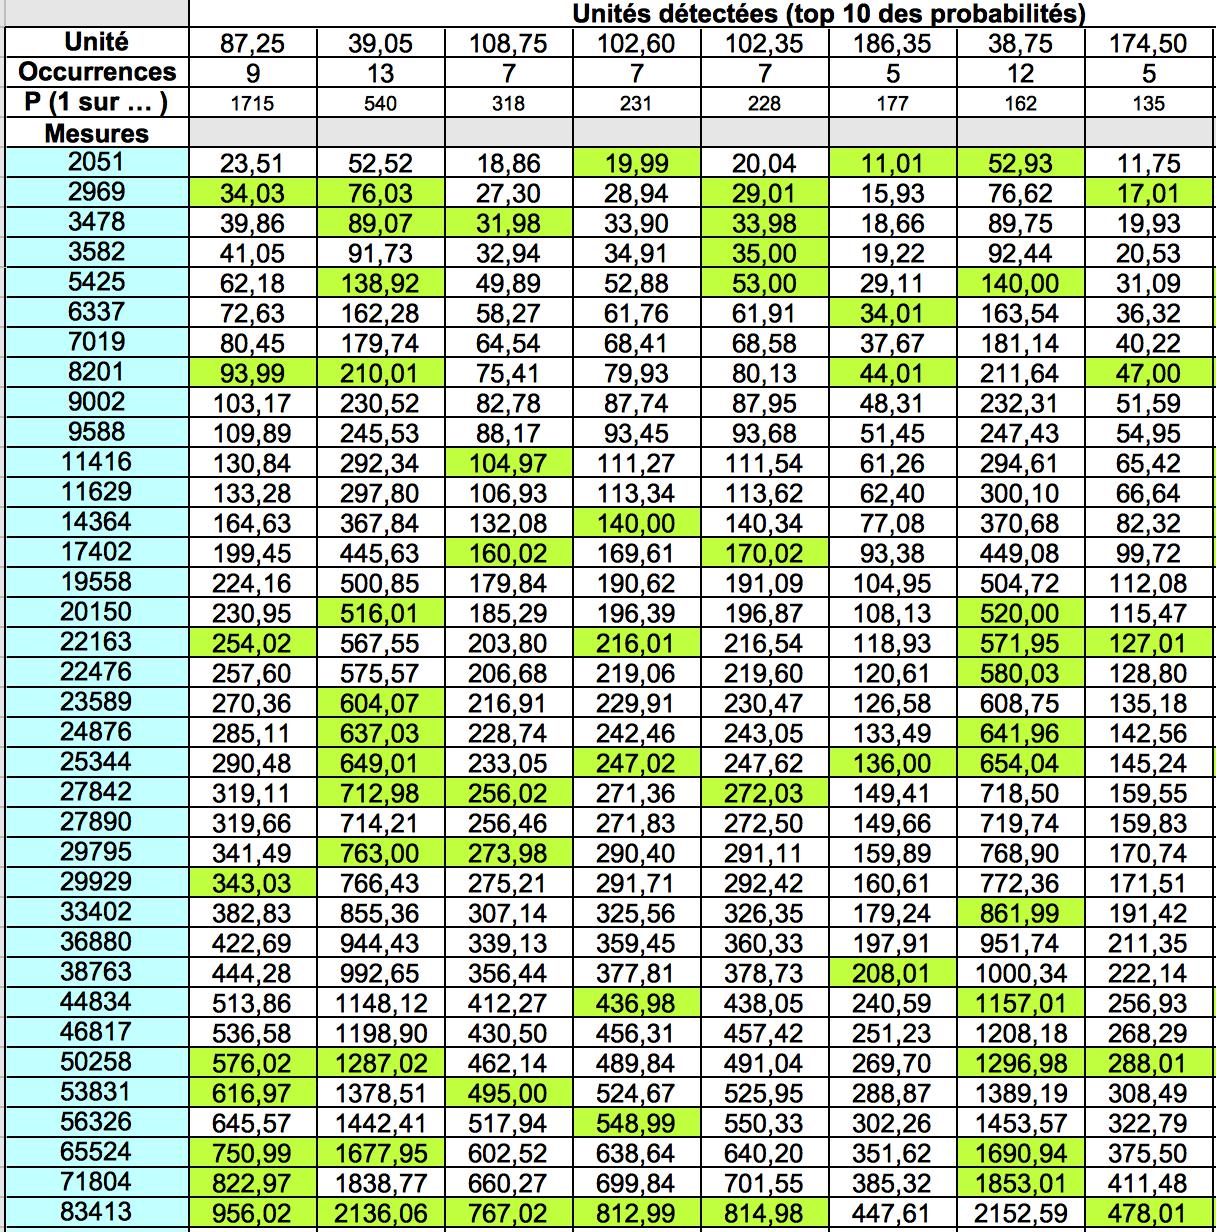 2017-11-16 17:43:07